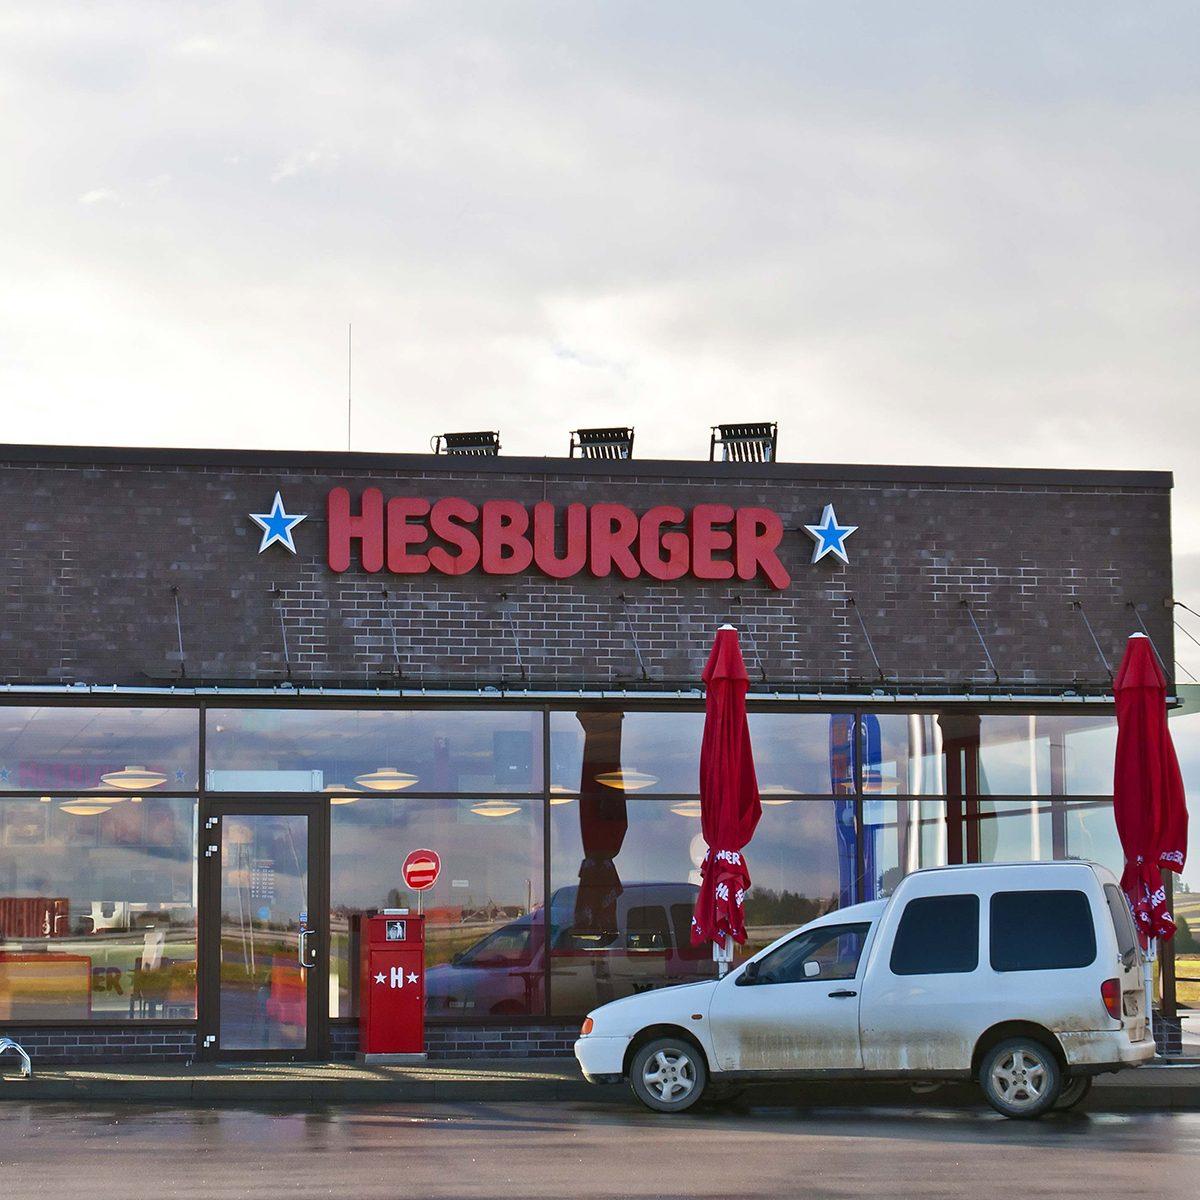 Hesburger